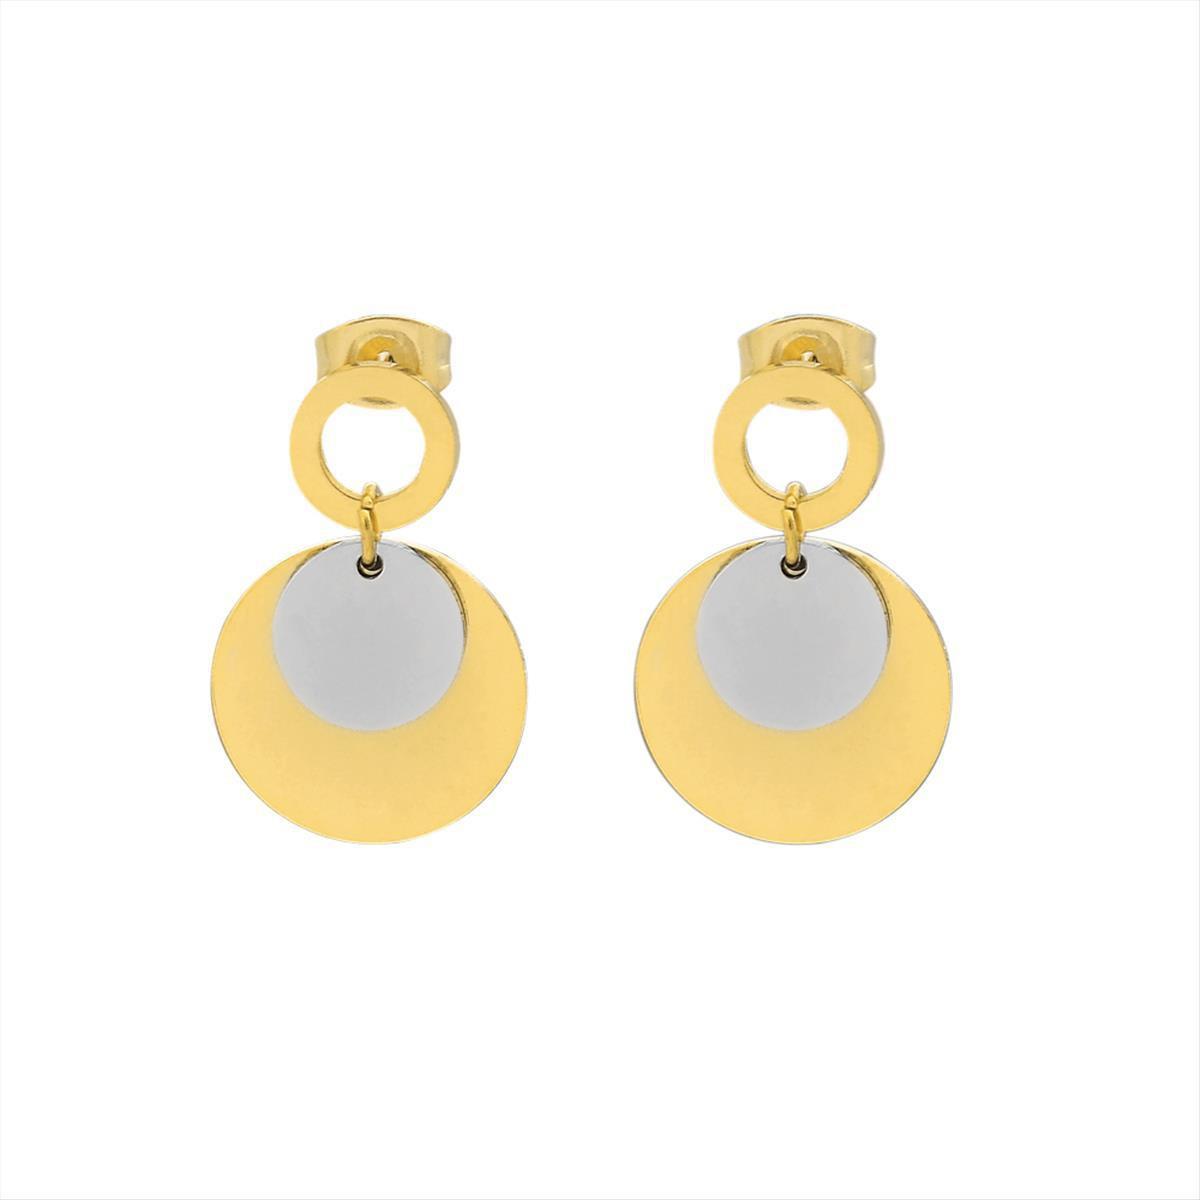 Boucles d'oreilles Edforce - 503-0007-E - Modalova